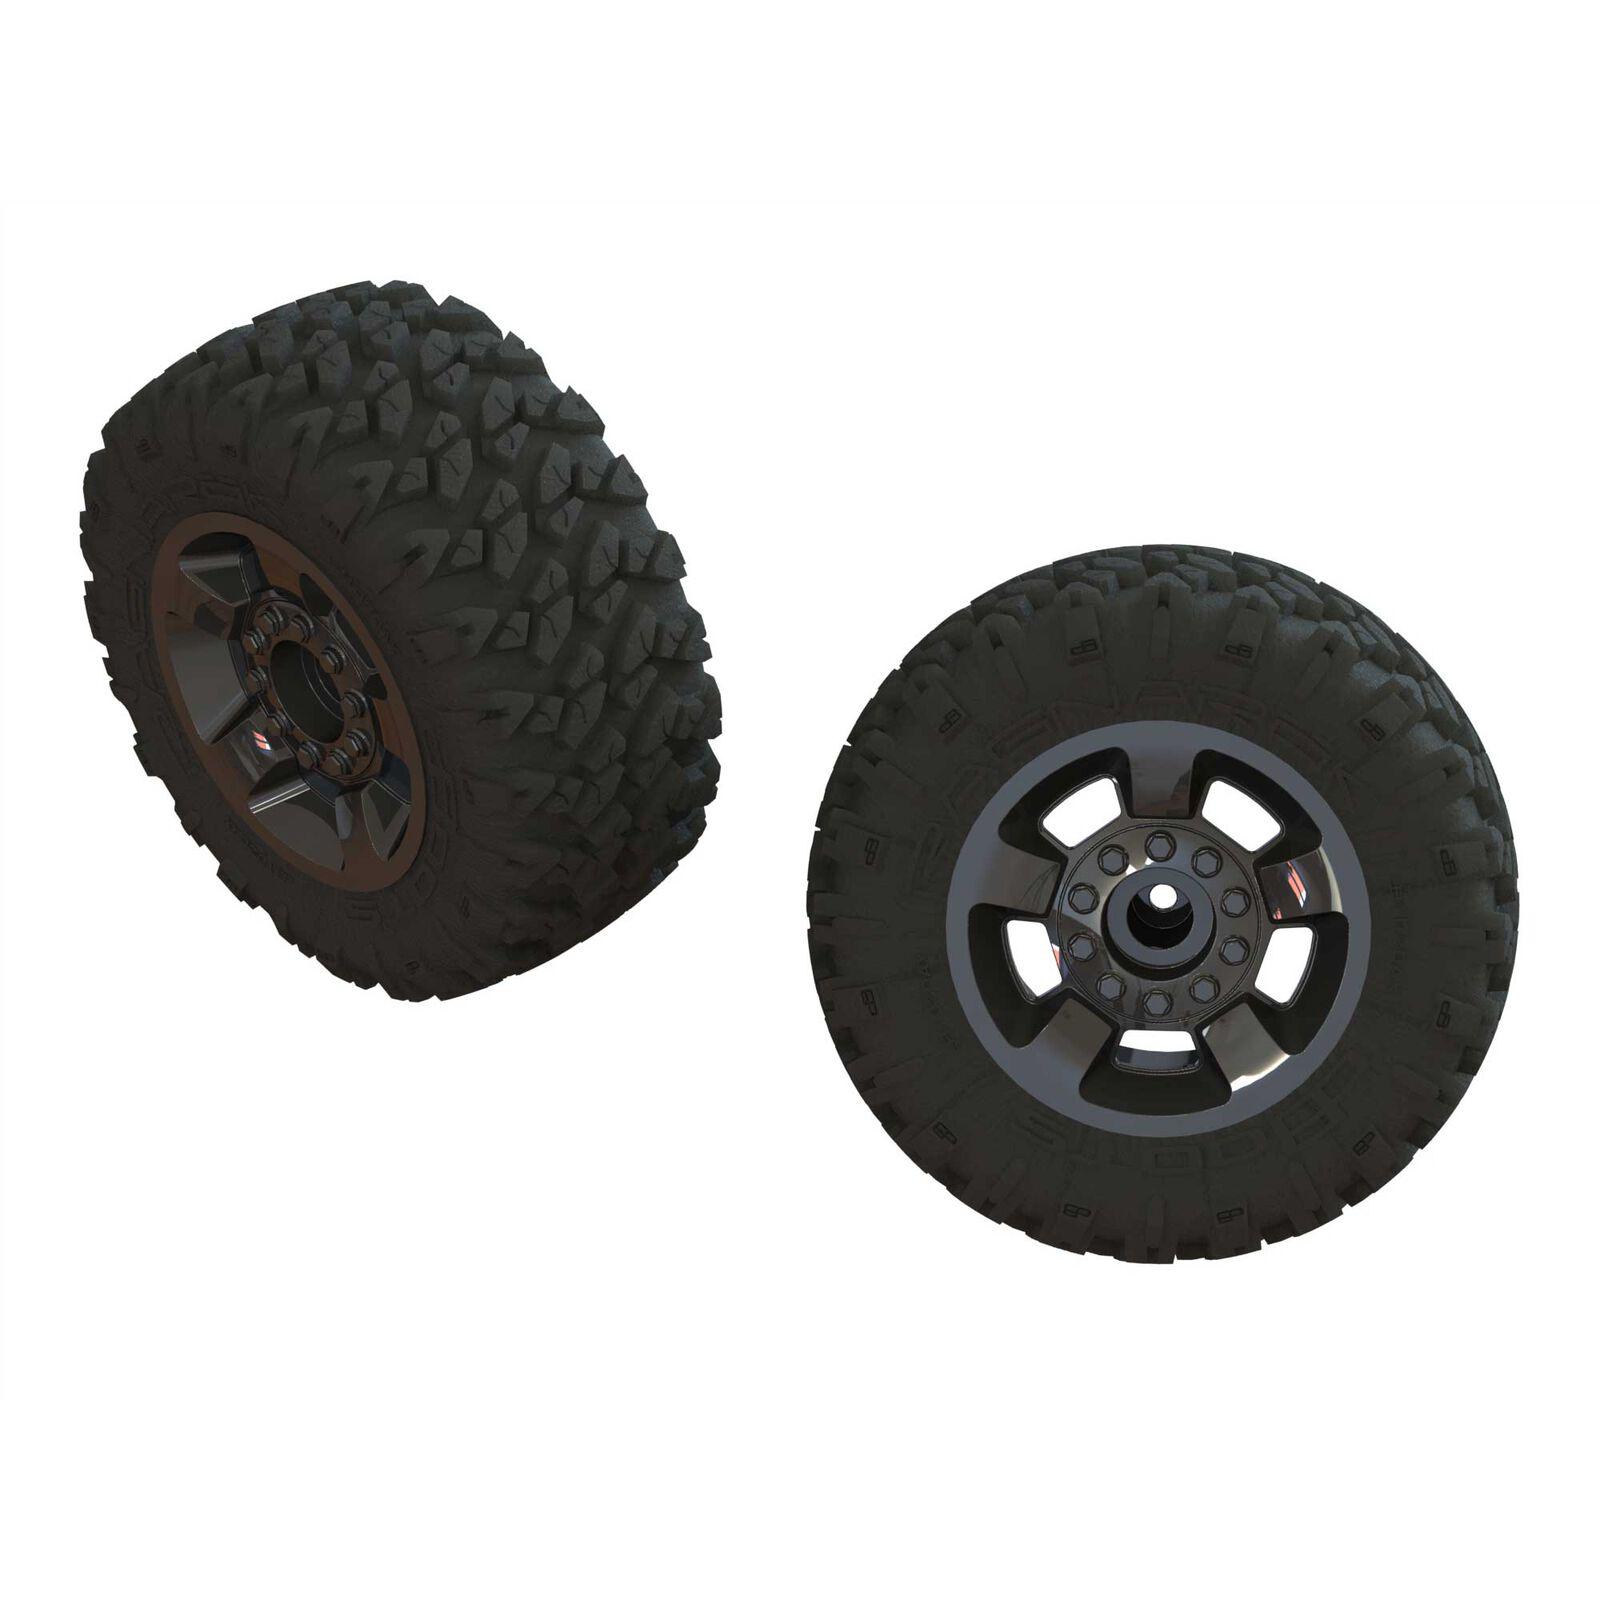 1/8 RAGNAROK MT Front/Rear 2.8 Pre-Mounted Tires, ST, 14mm Hex, Black Chrome (2)